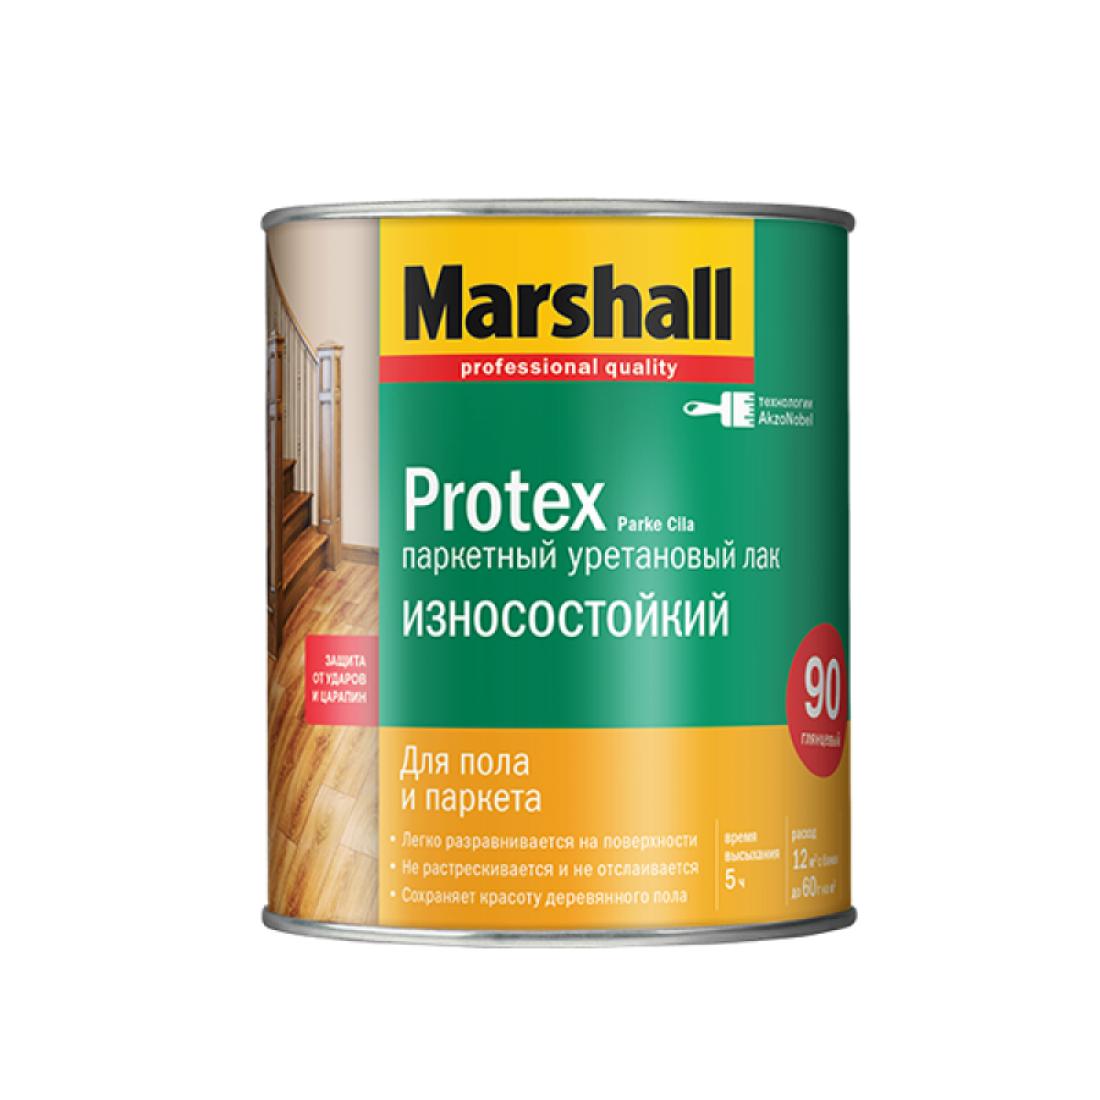 PROTEX PARKE лак алкид уретановый, глянцевый (0,75л)